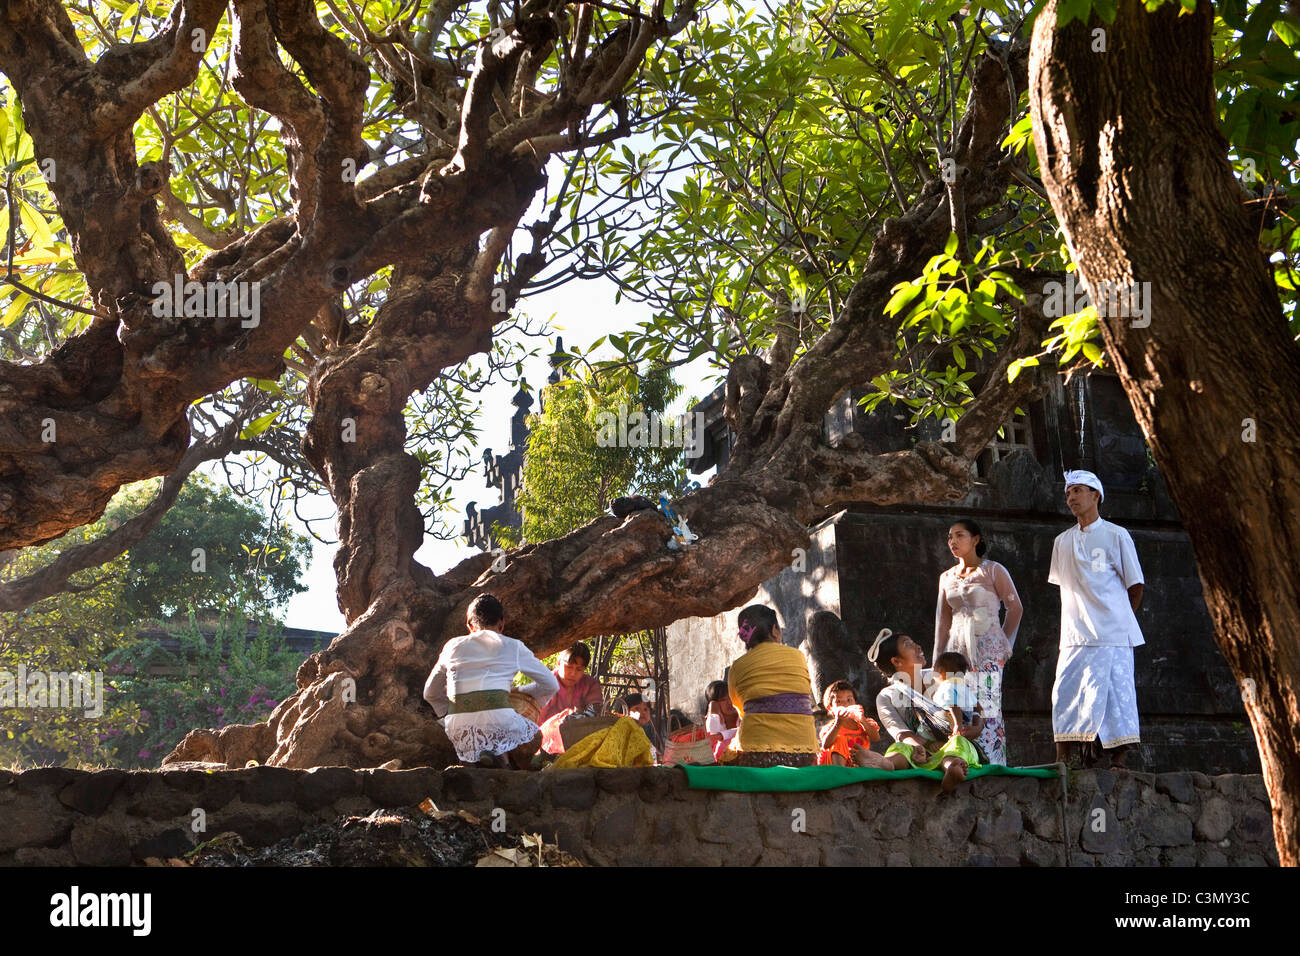 Indonesia, Island Bali, Alassari, Sea temple called Pura Ponjok Batu. Festival to honor the gods of the sea. Melasty - Stock Image